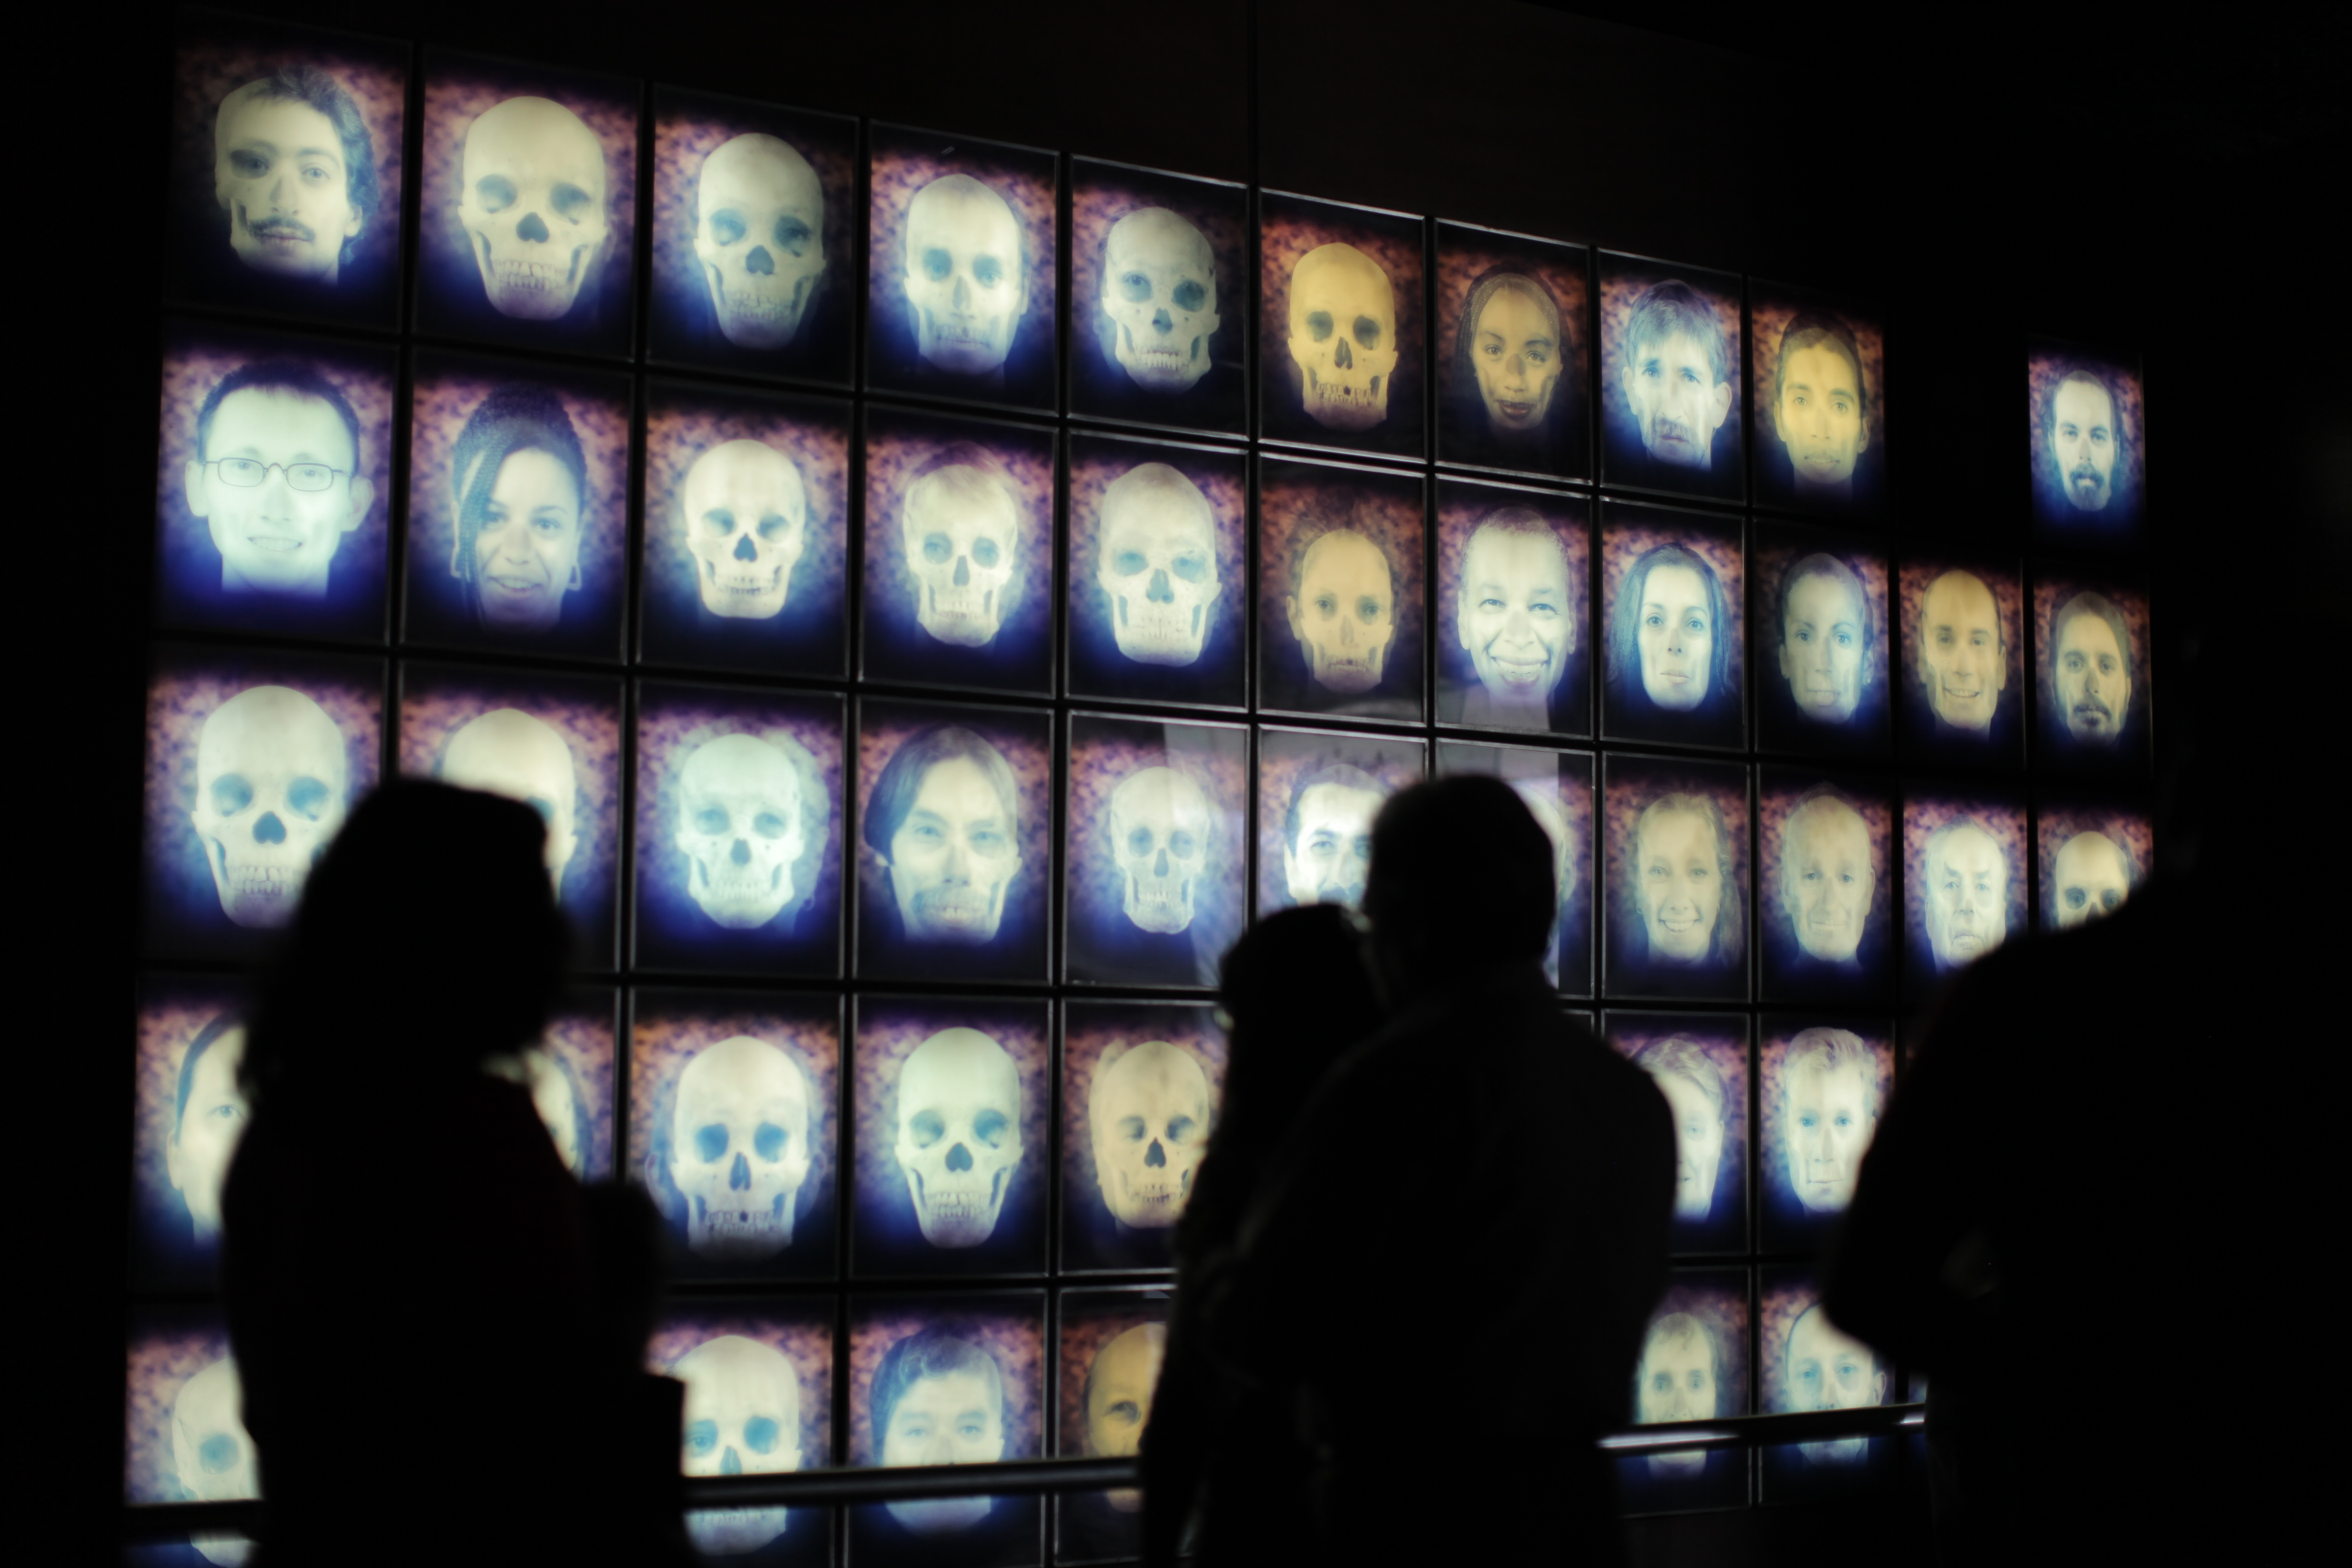 Light & Death - Museo Nacional de Antropología, Mexico 2015